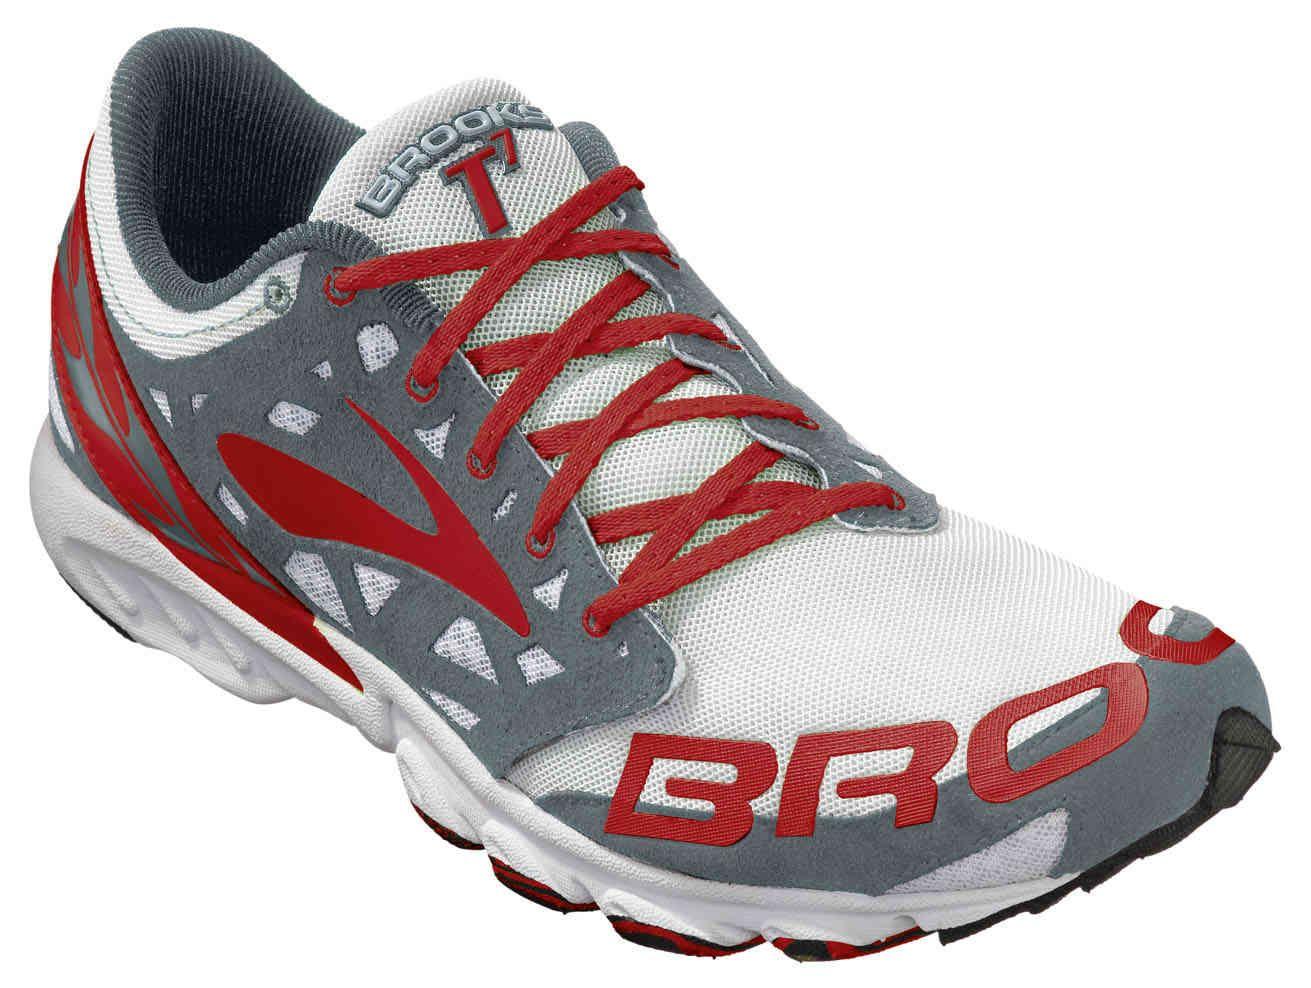 43d20043891 Brooks T7 Racer  Lightweight minimal road racing shoe - only 6.3 ounces